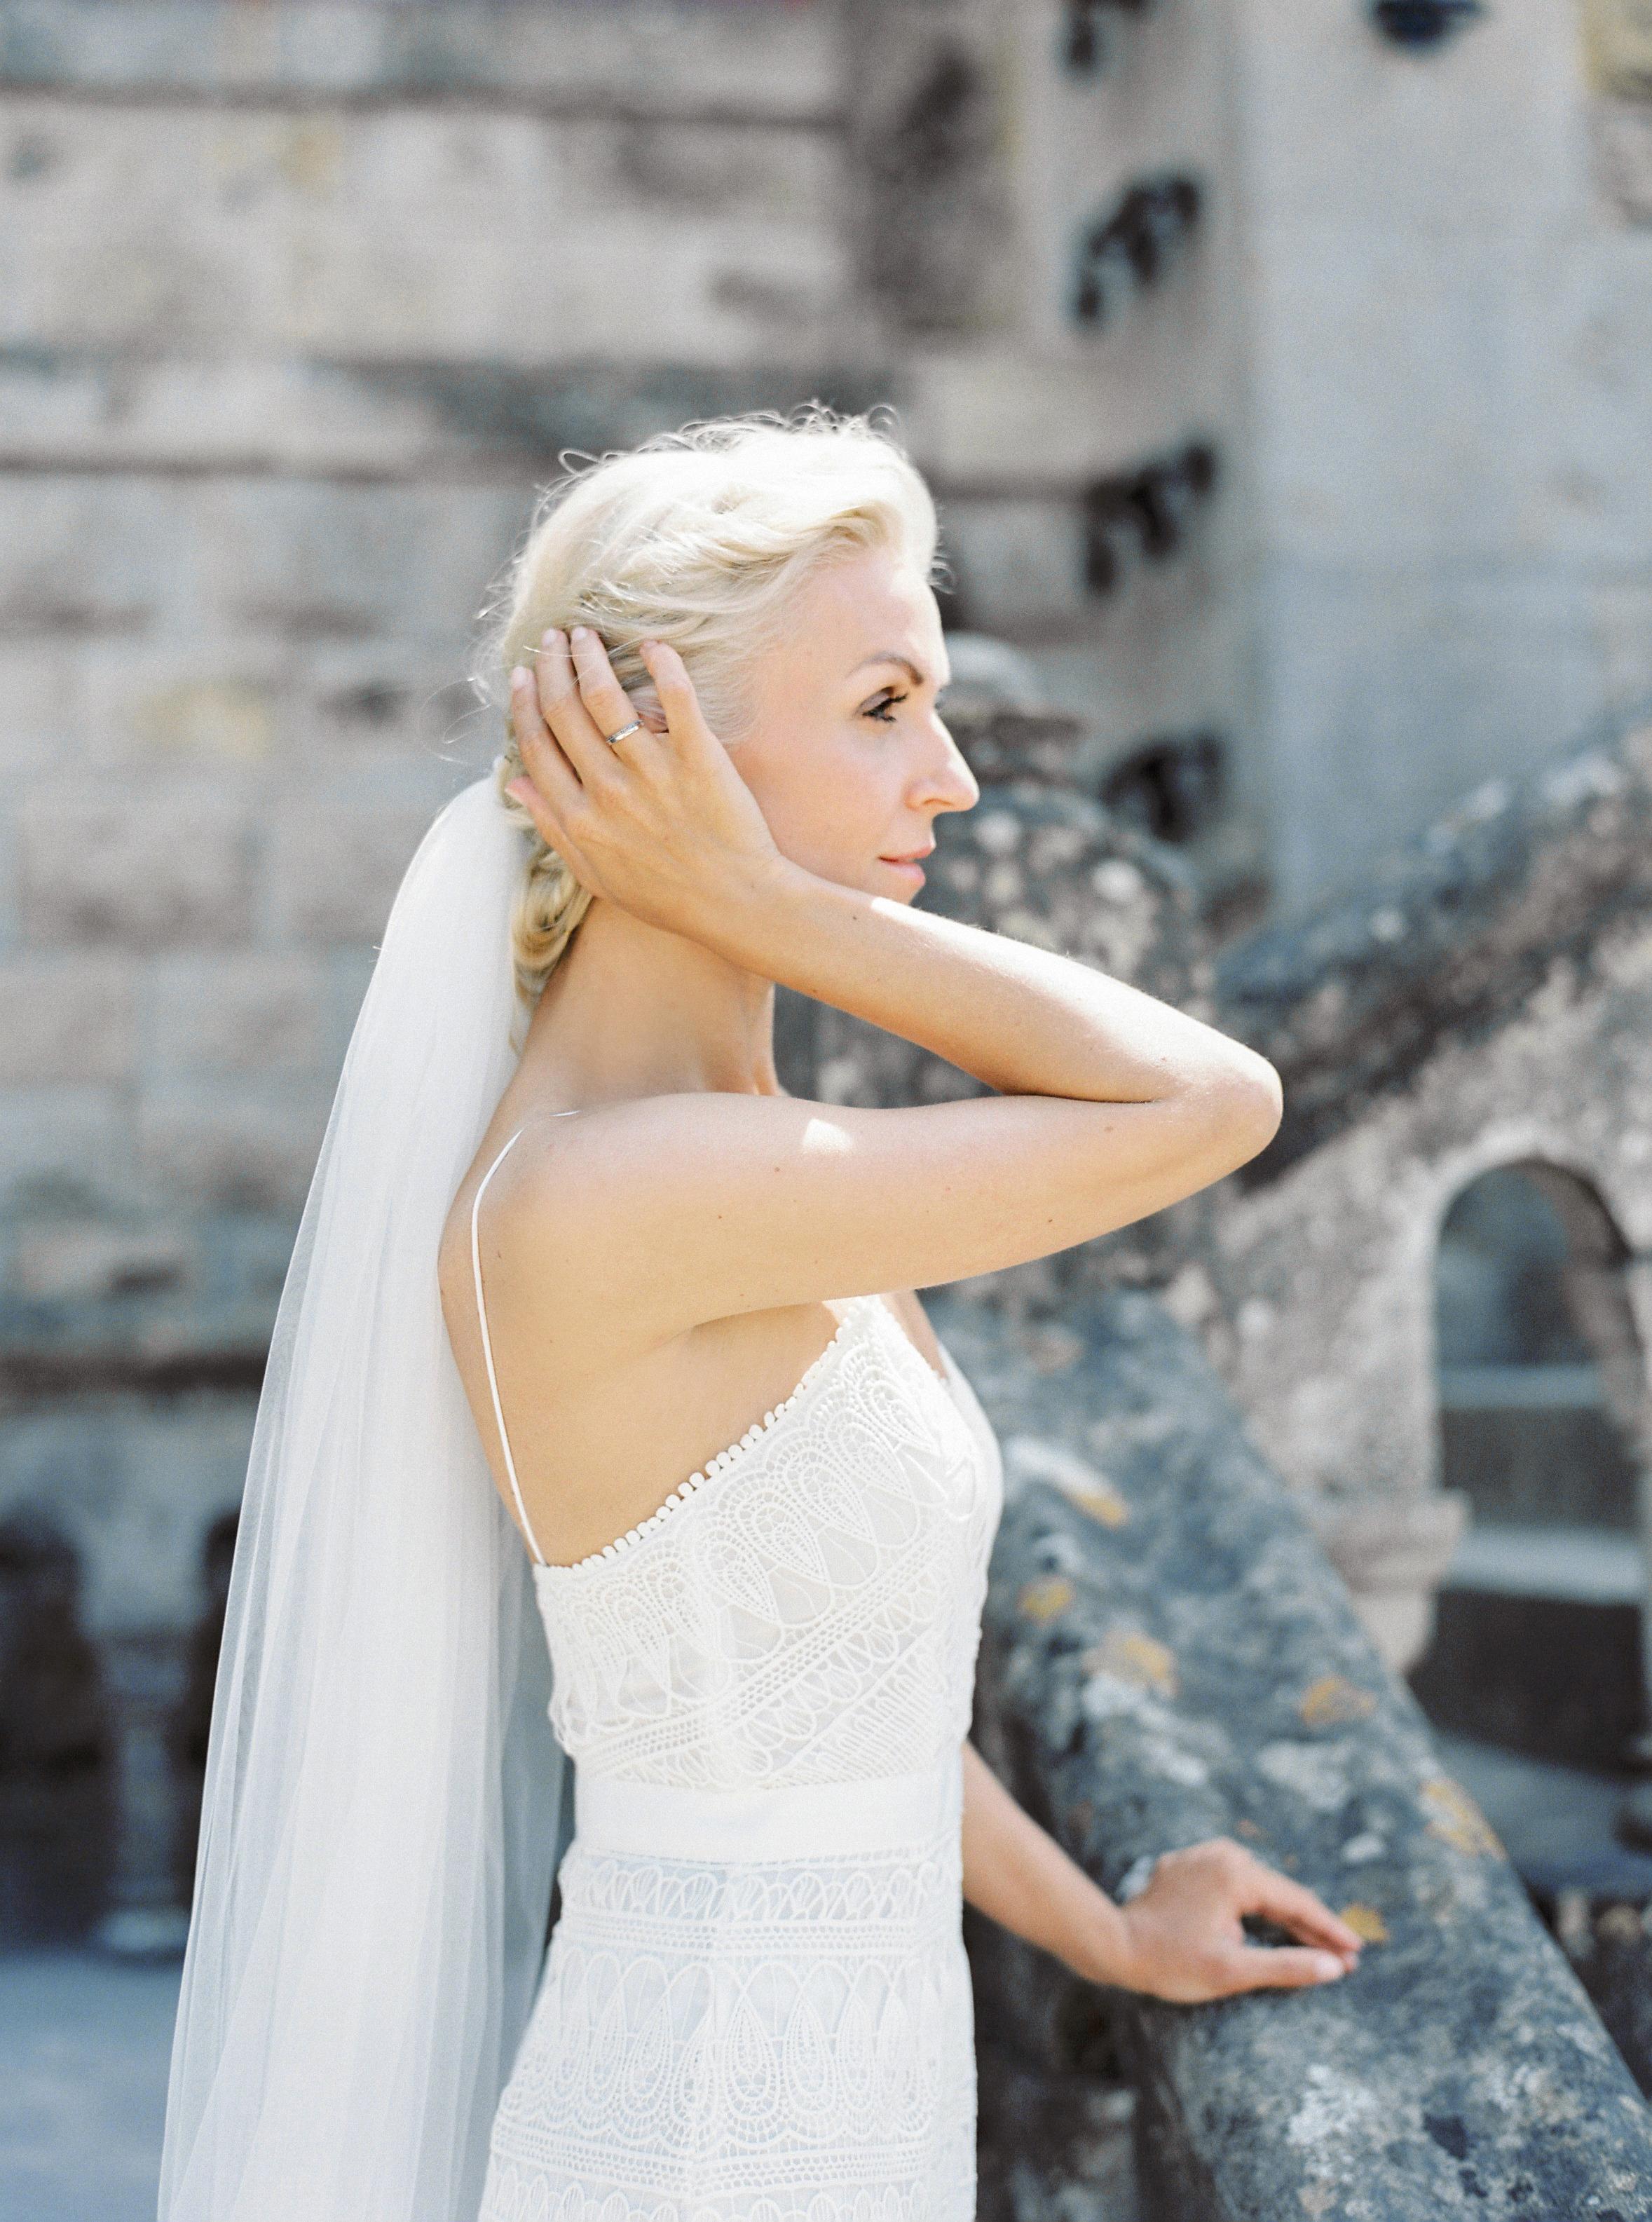 Nastia_Vesna_Photography_Wedding_Portugal_39.jpg